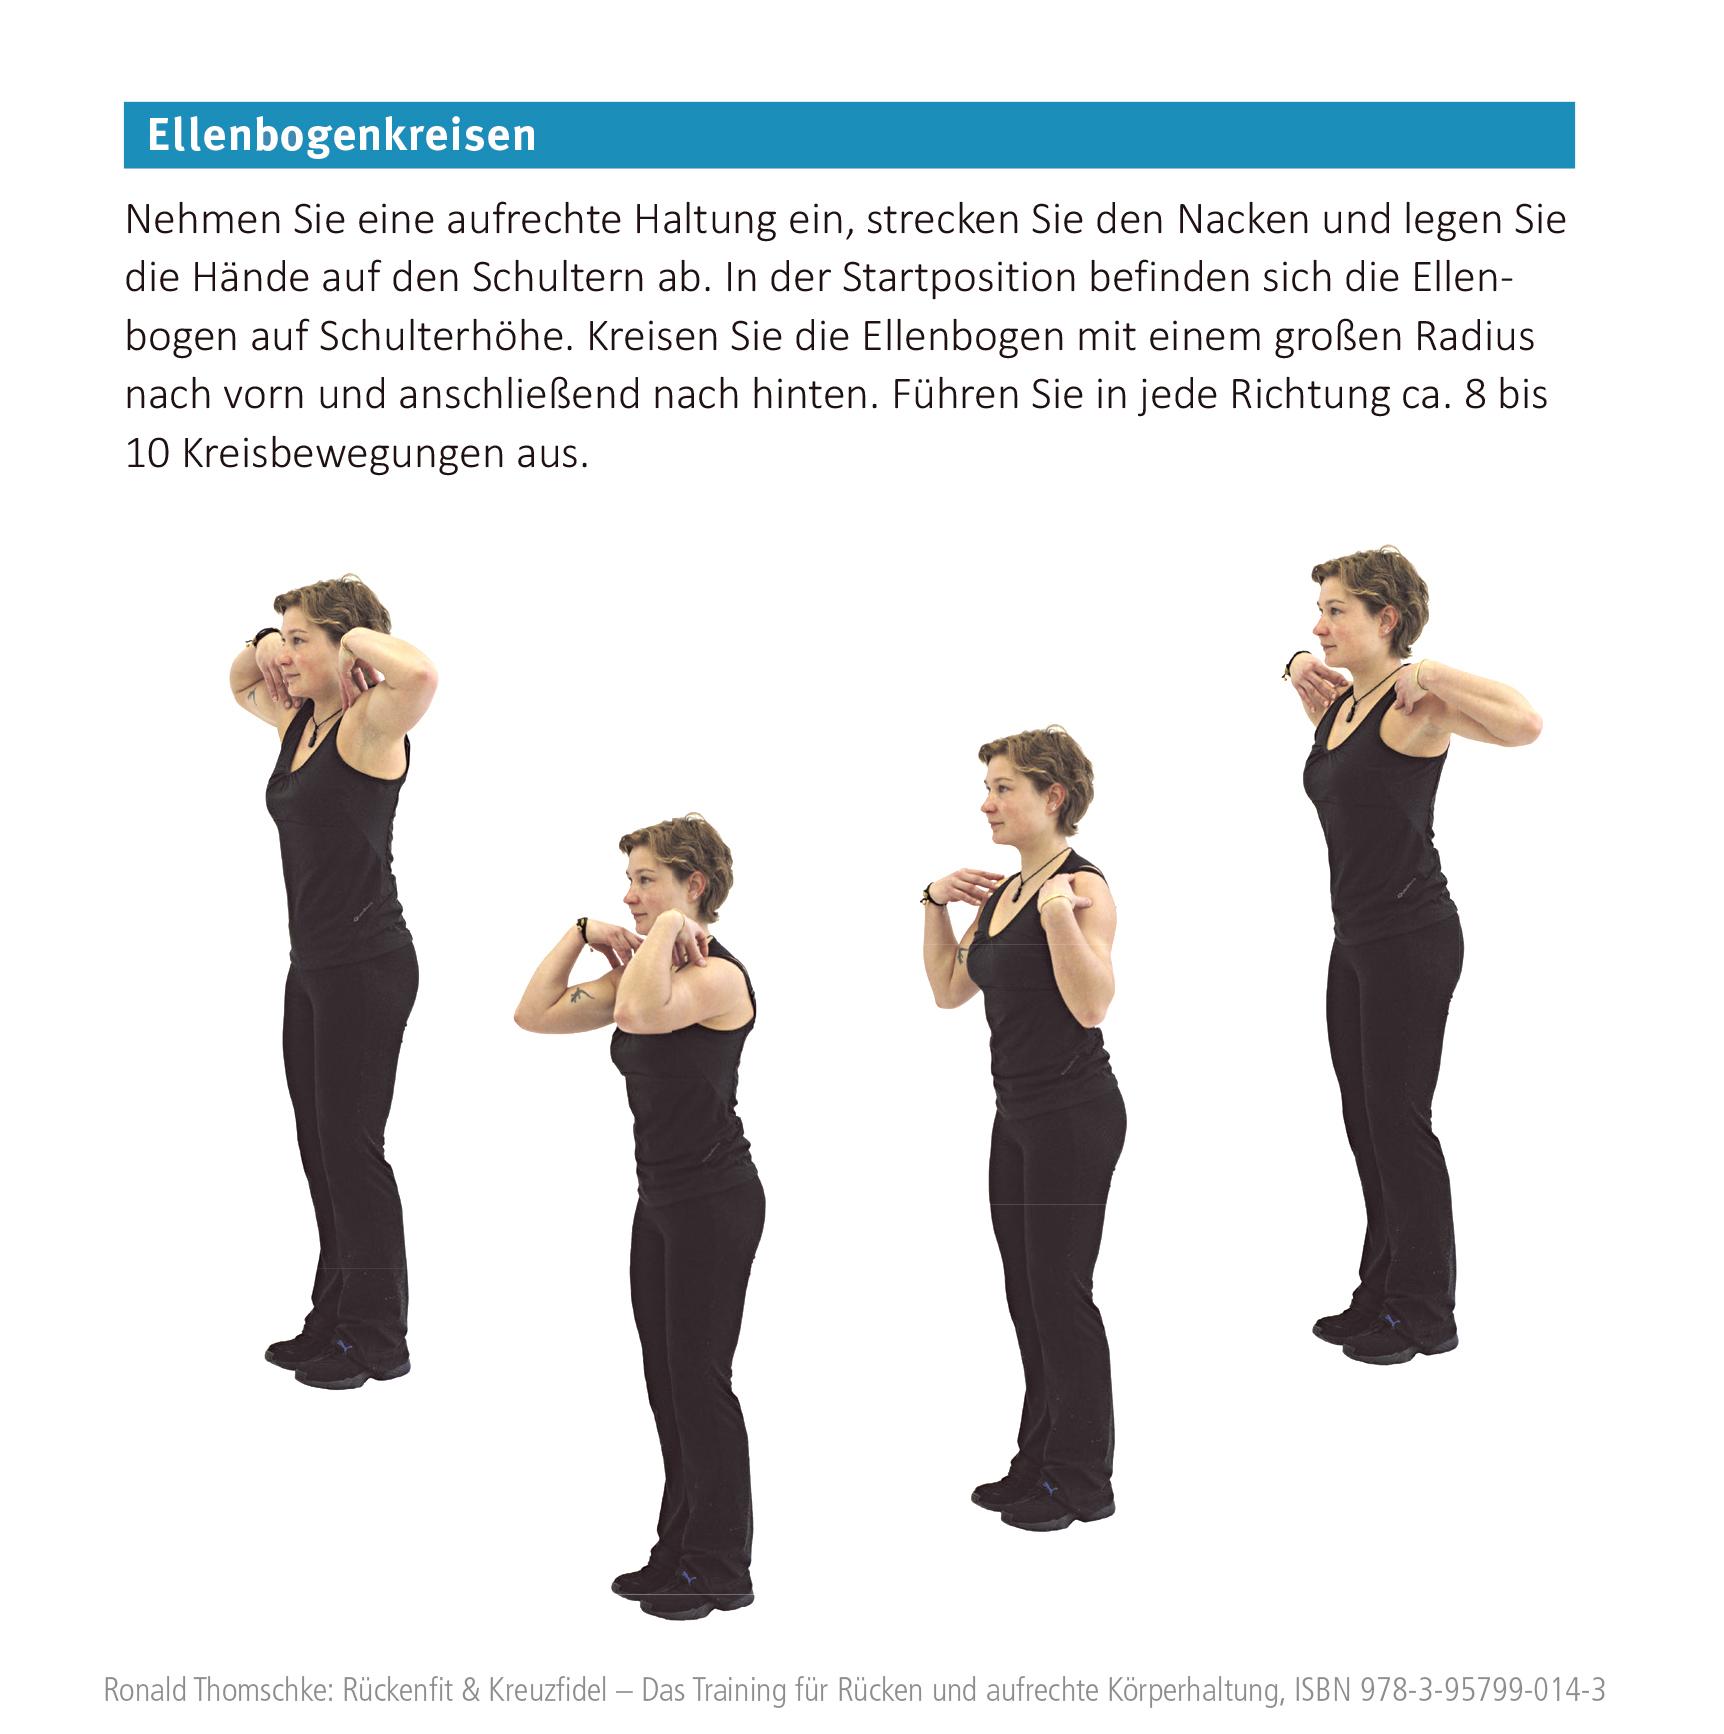 Ellenbogenkreisen gegen Rückenschmerzen